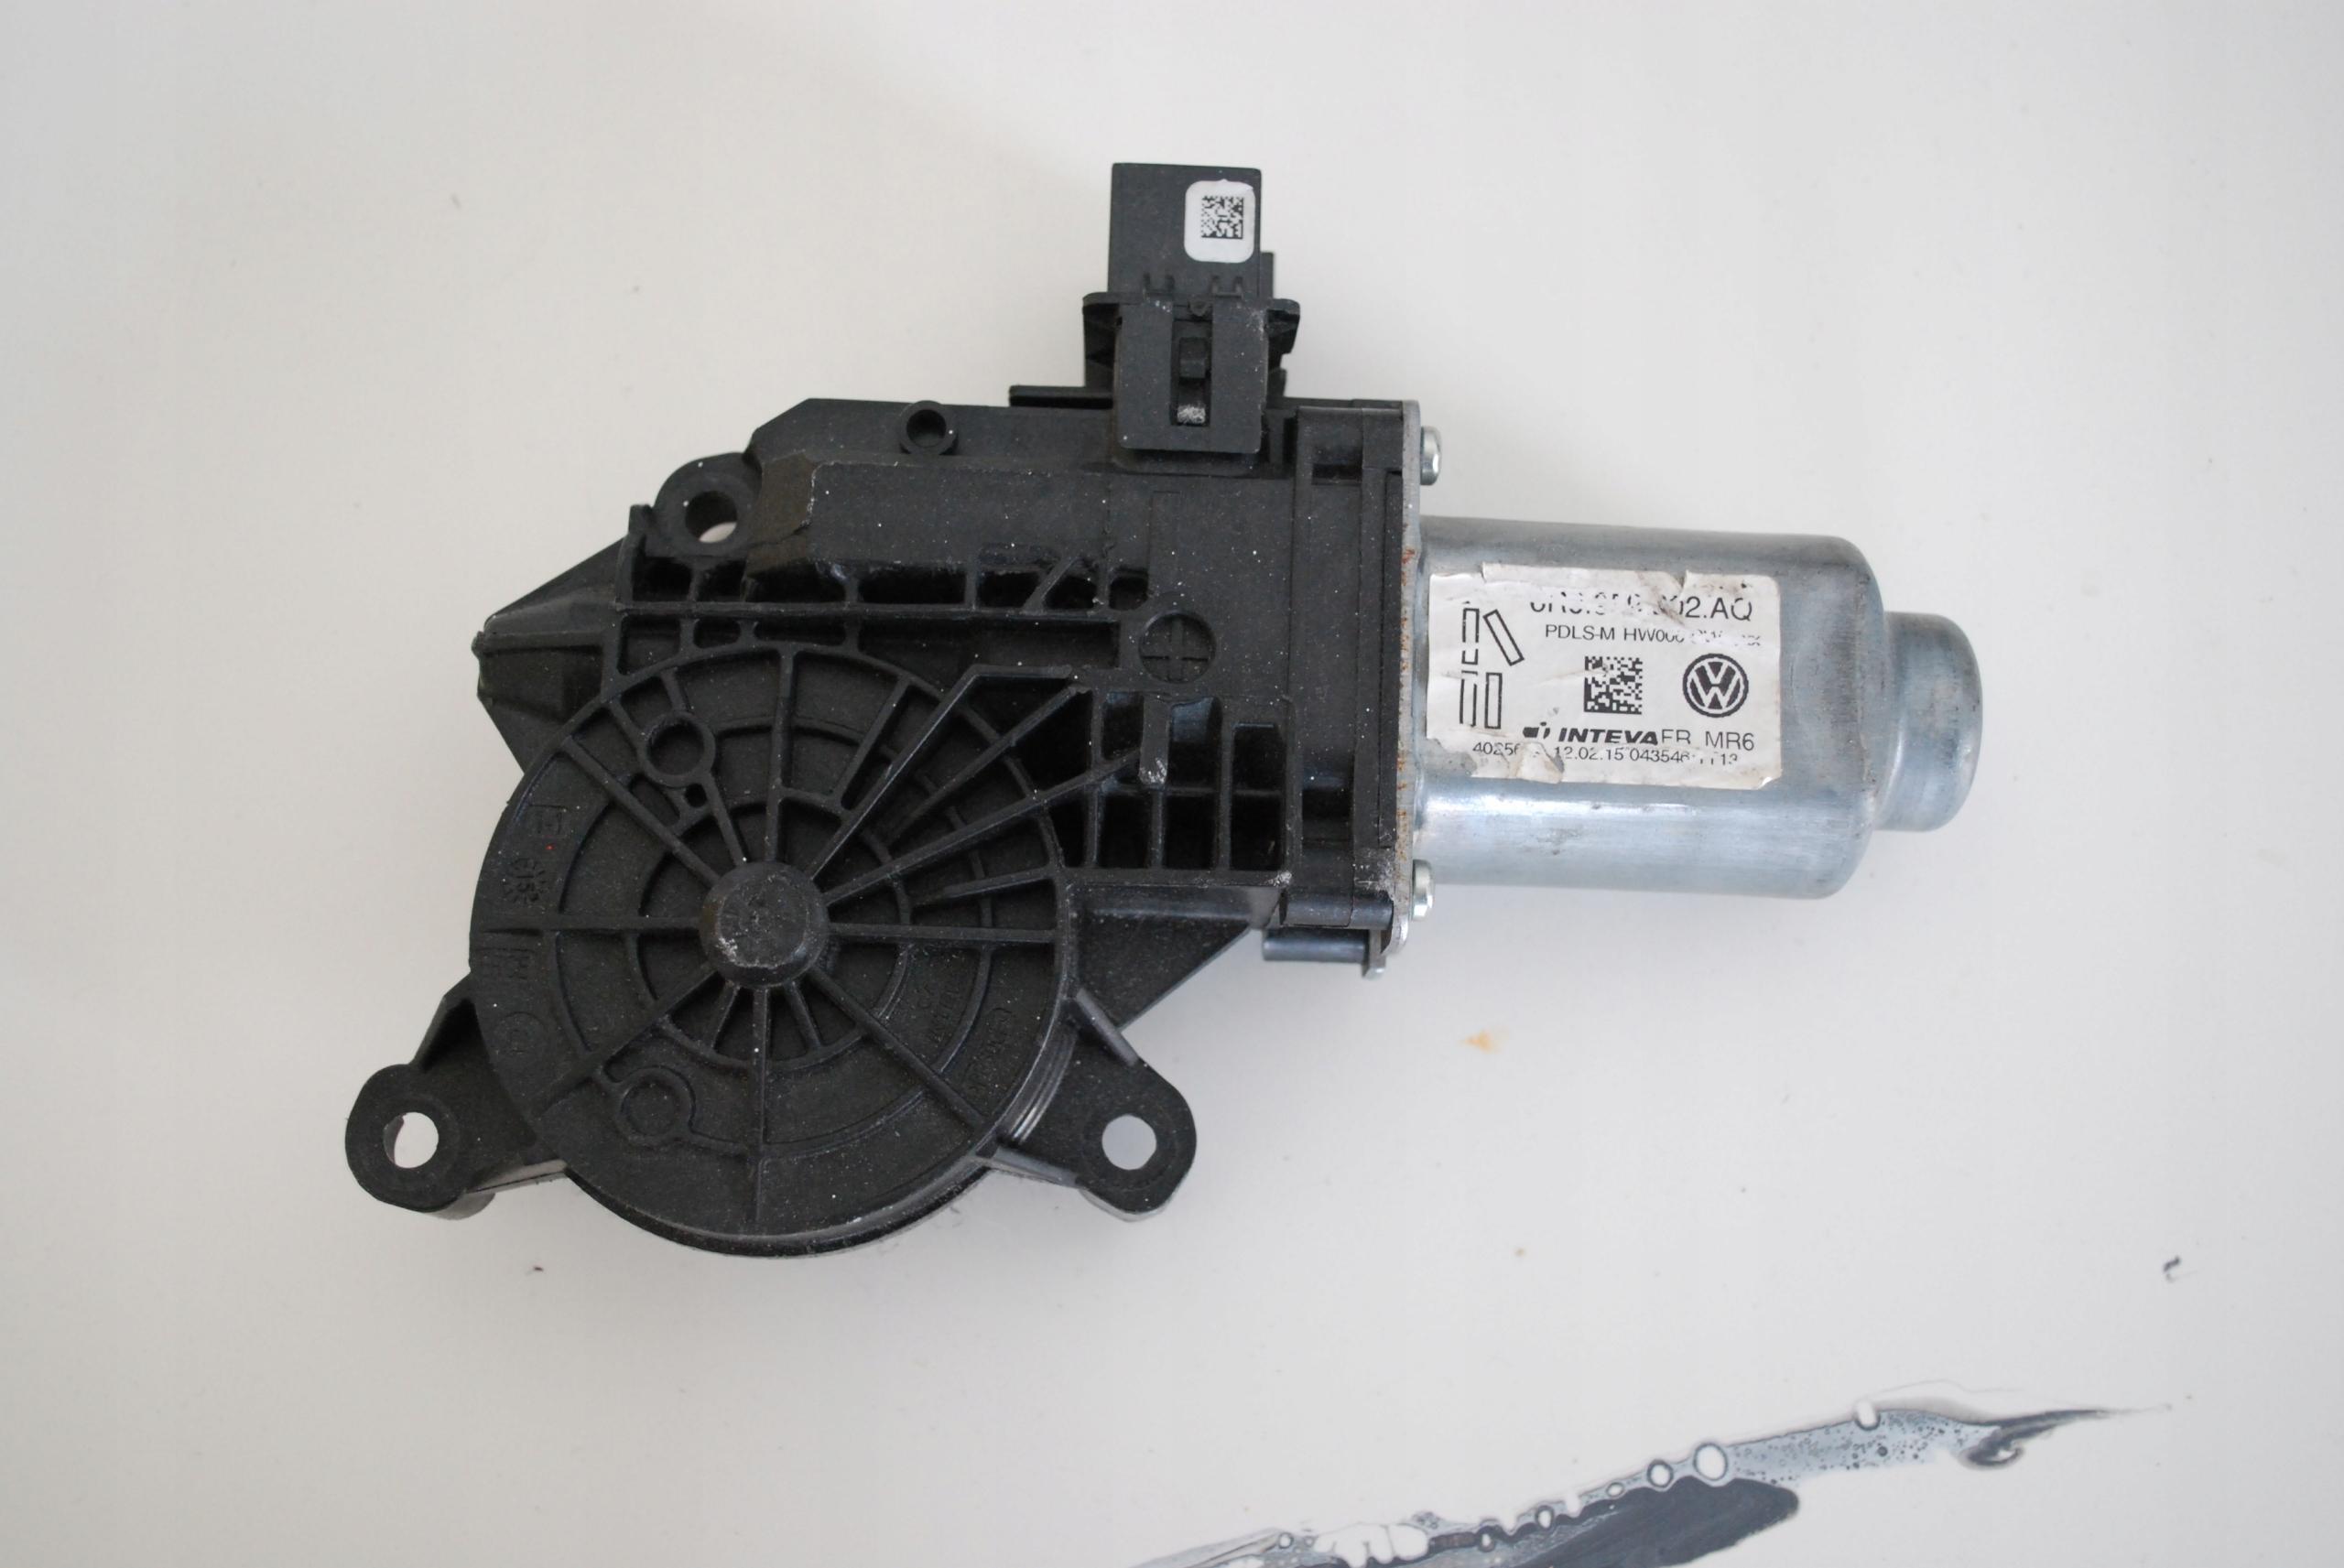 двигатель правый вперед 6r0959802aq roomster fabia ii